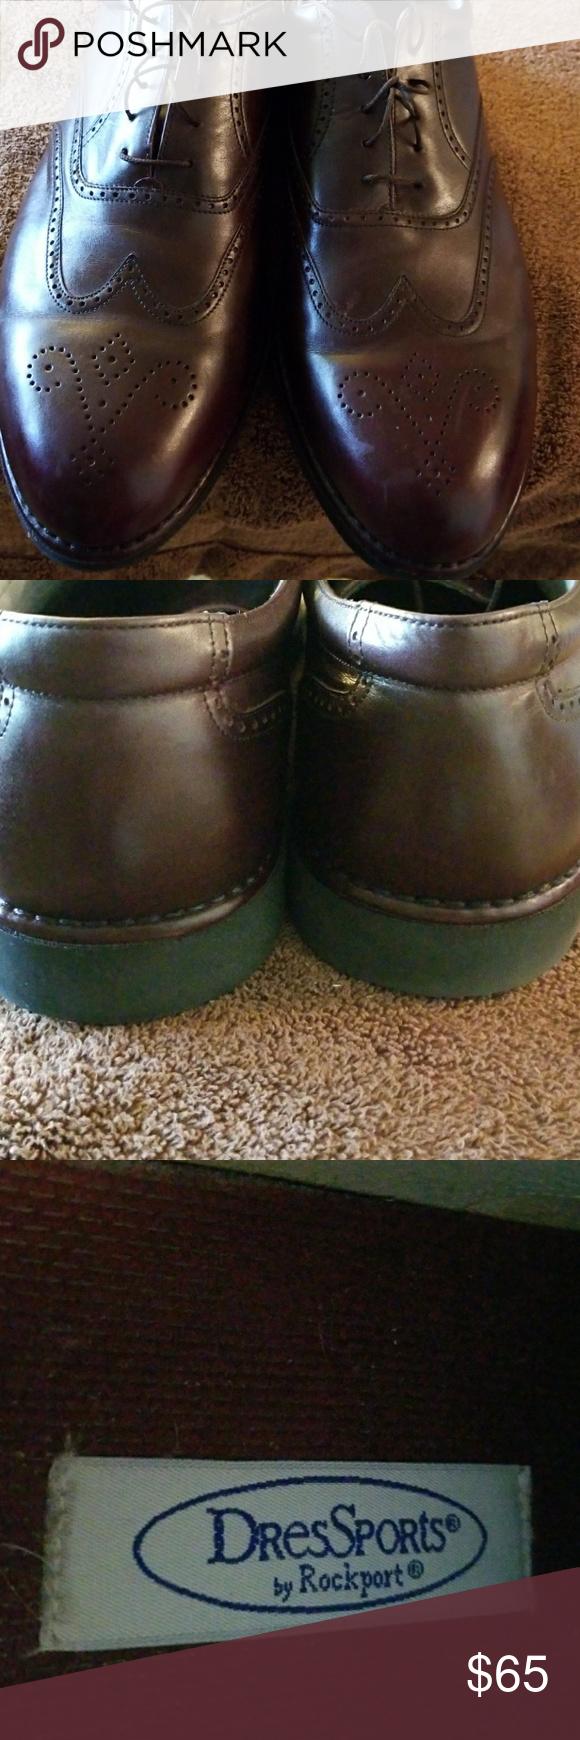 DresSports Size 15W GUC... Rockport Comfort... Great Dress Shoe Rockport Shoes Oxfords & Derbys